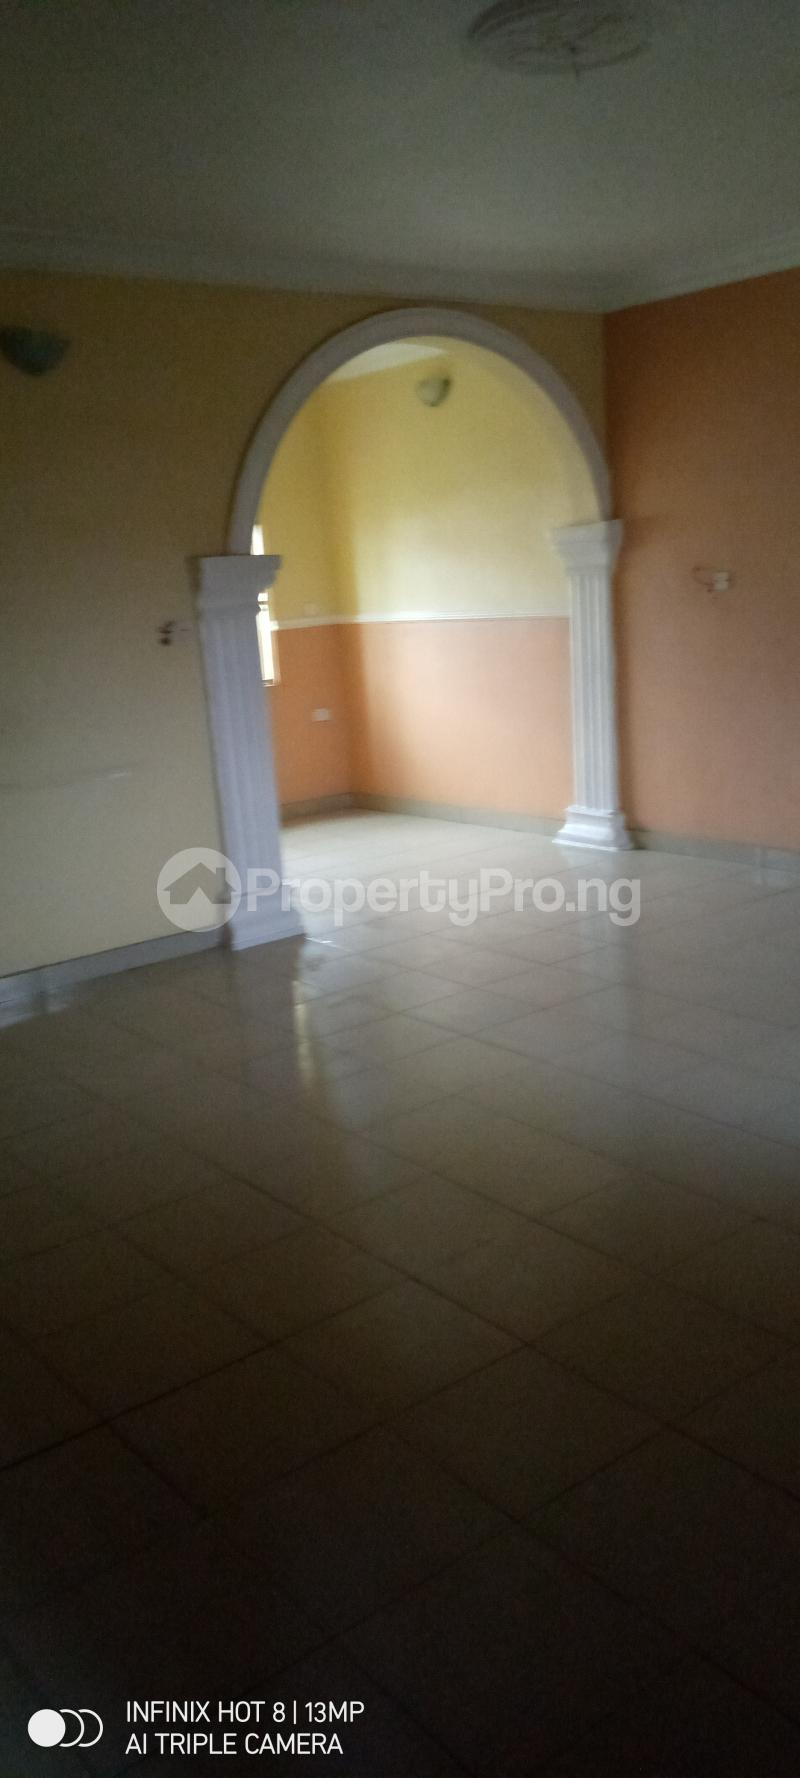 3 bedroom Flat / Apartment for rent Green field estate Amuwo Odofin Amuwo Odofin Lagos - 1